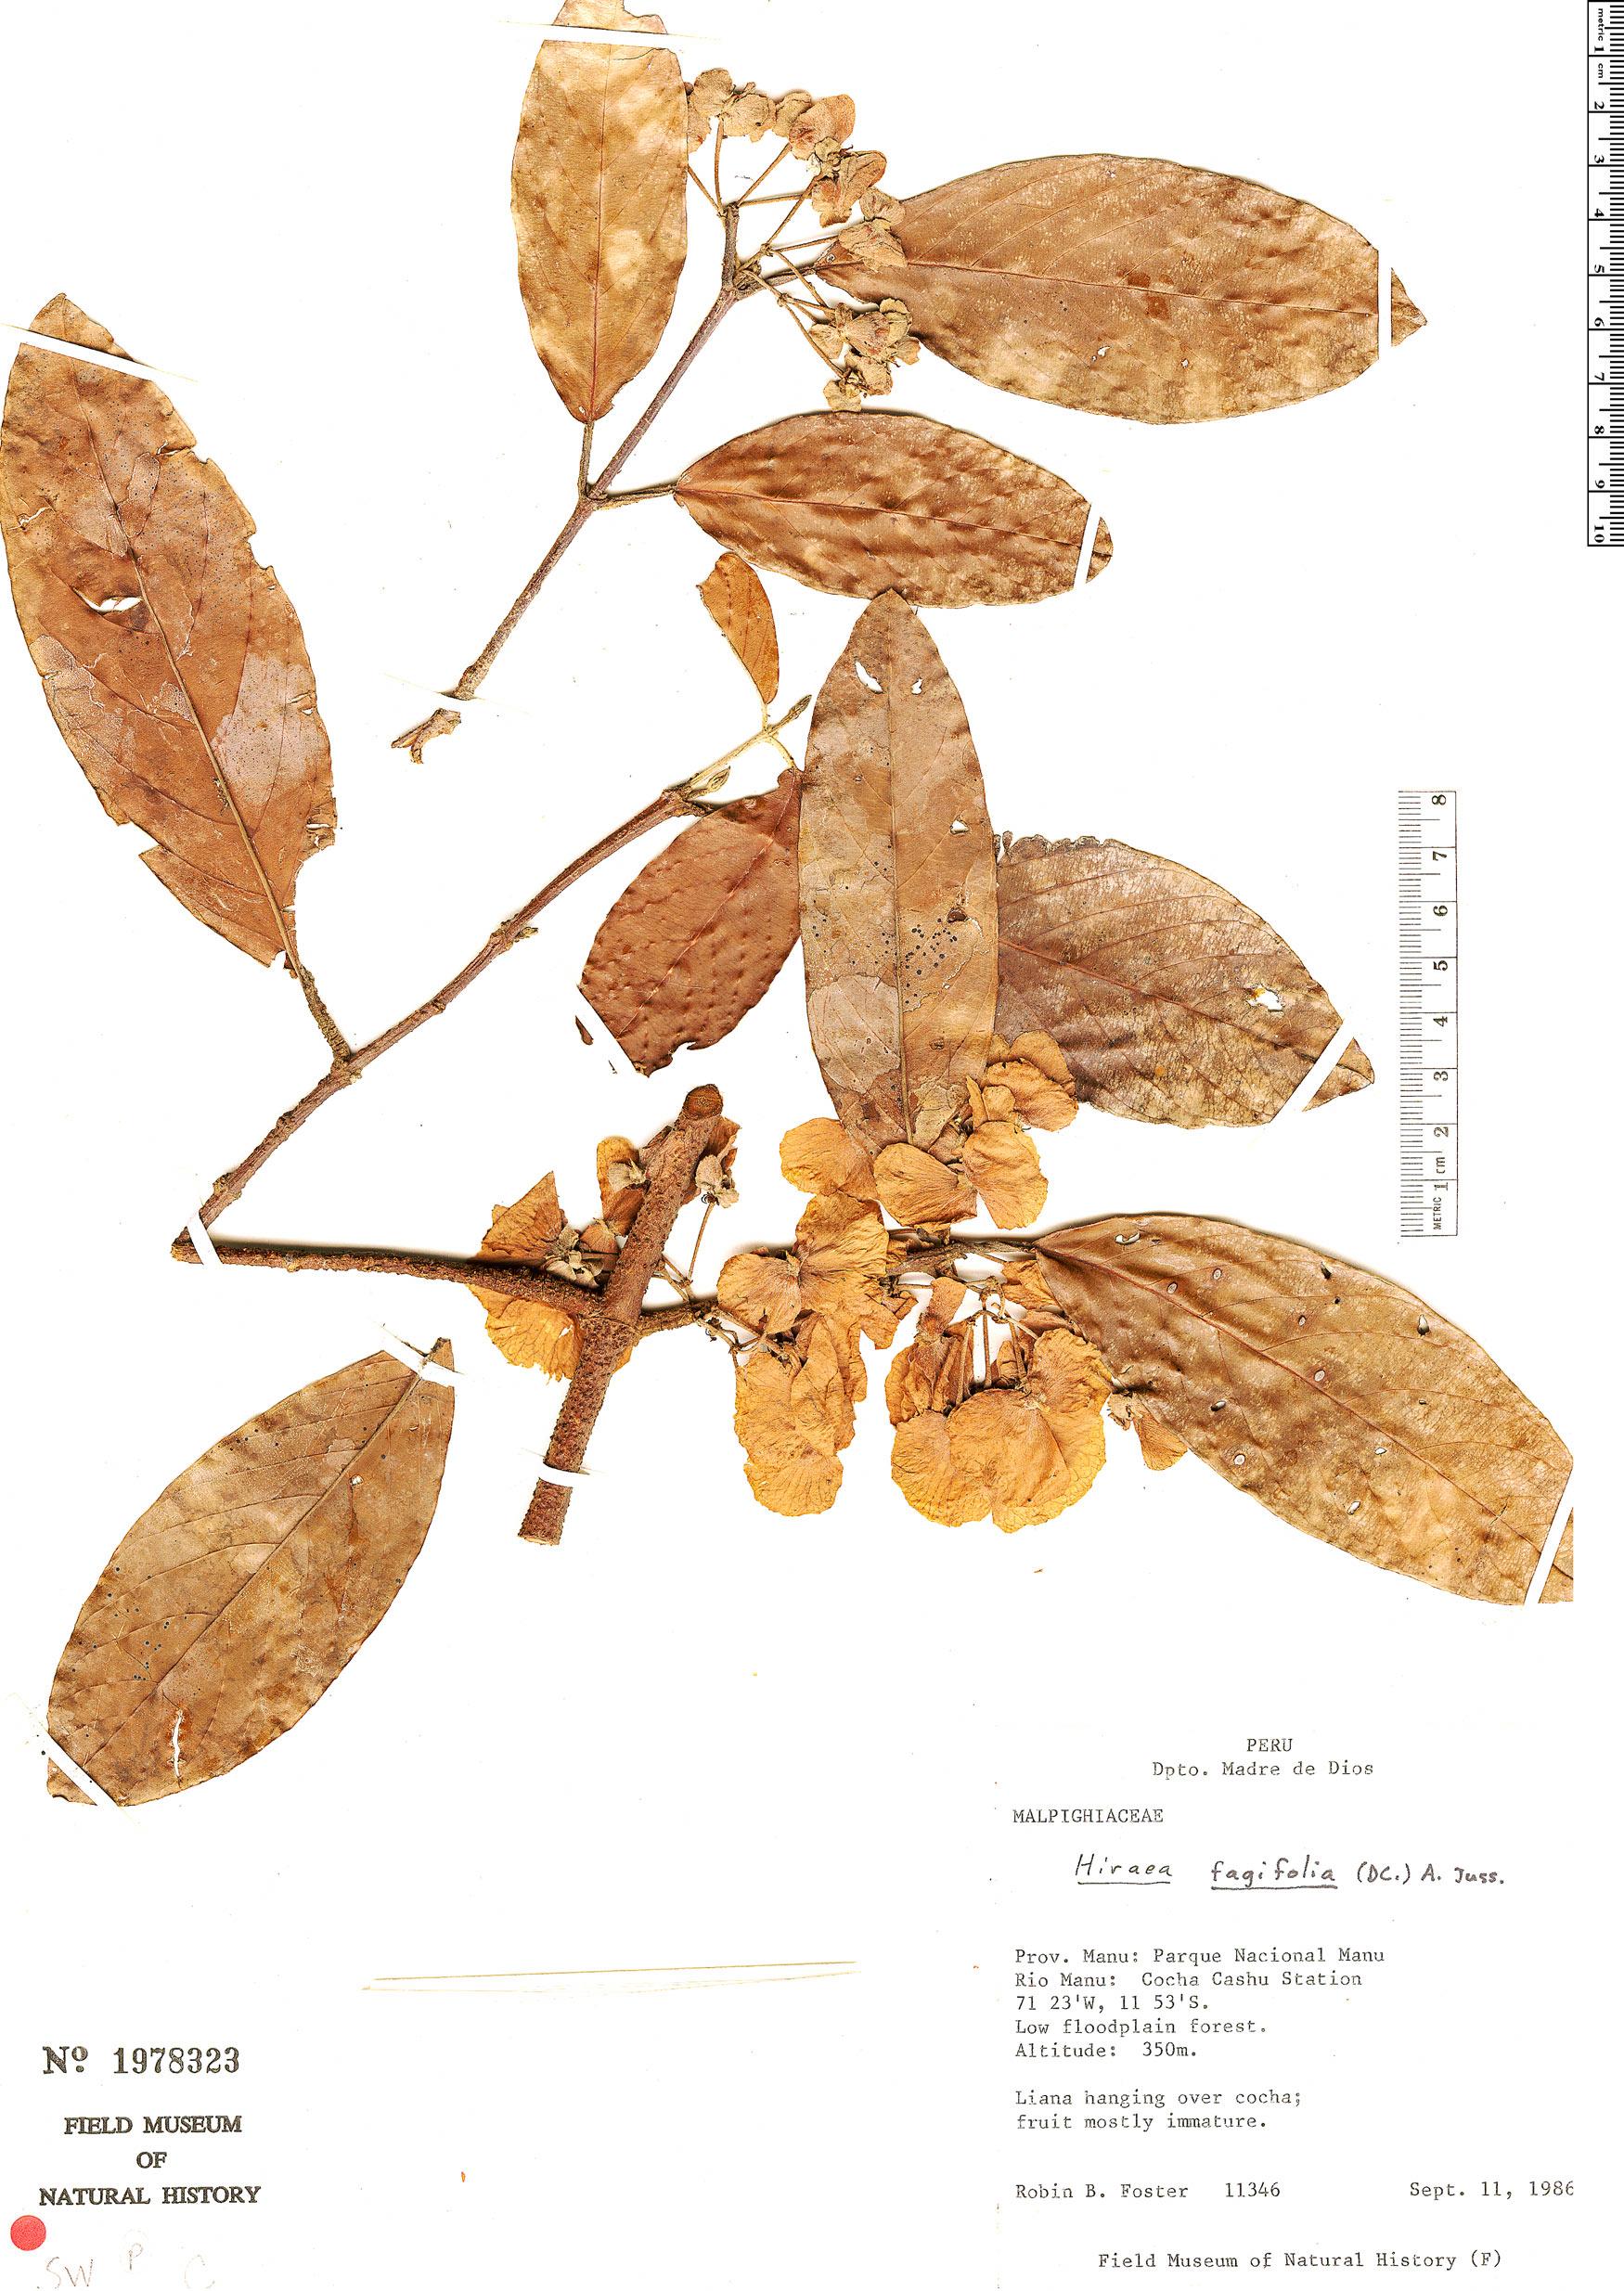 Specimen: Hiraea fagifolia